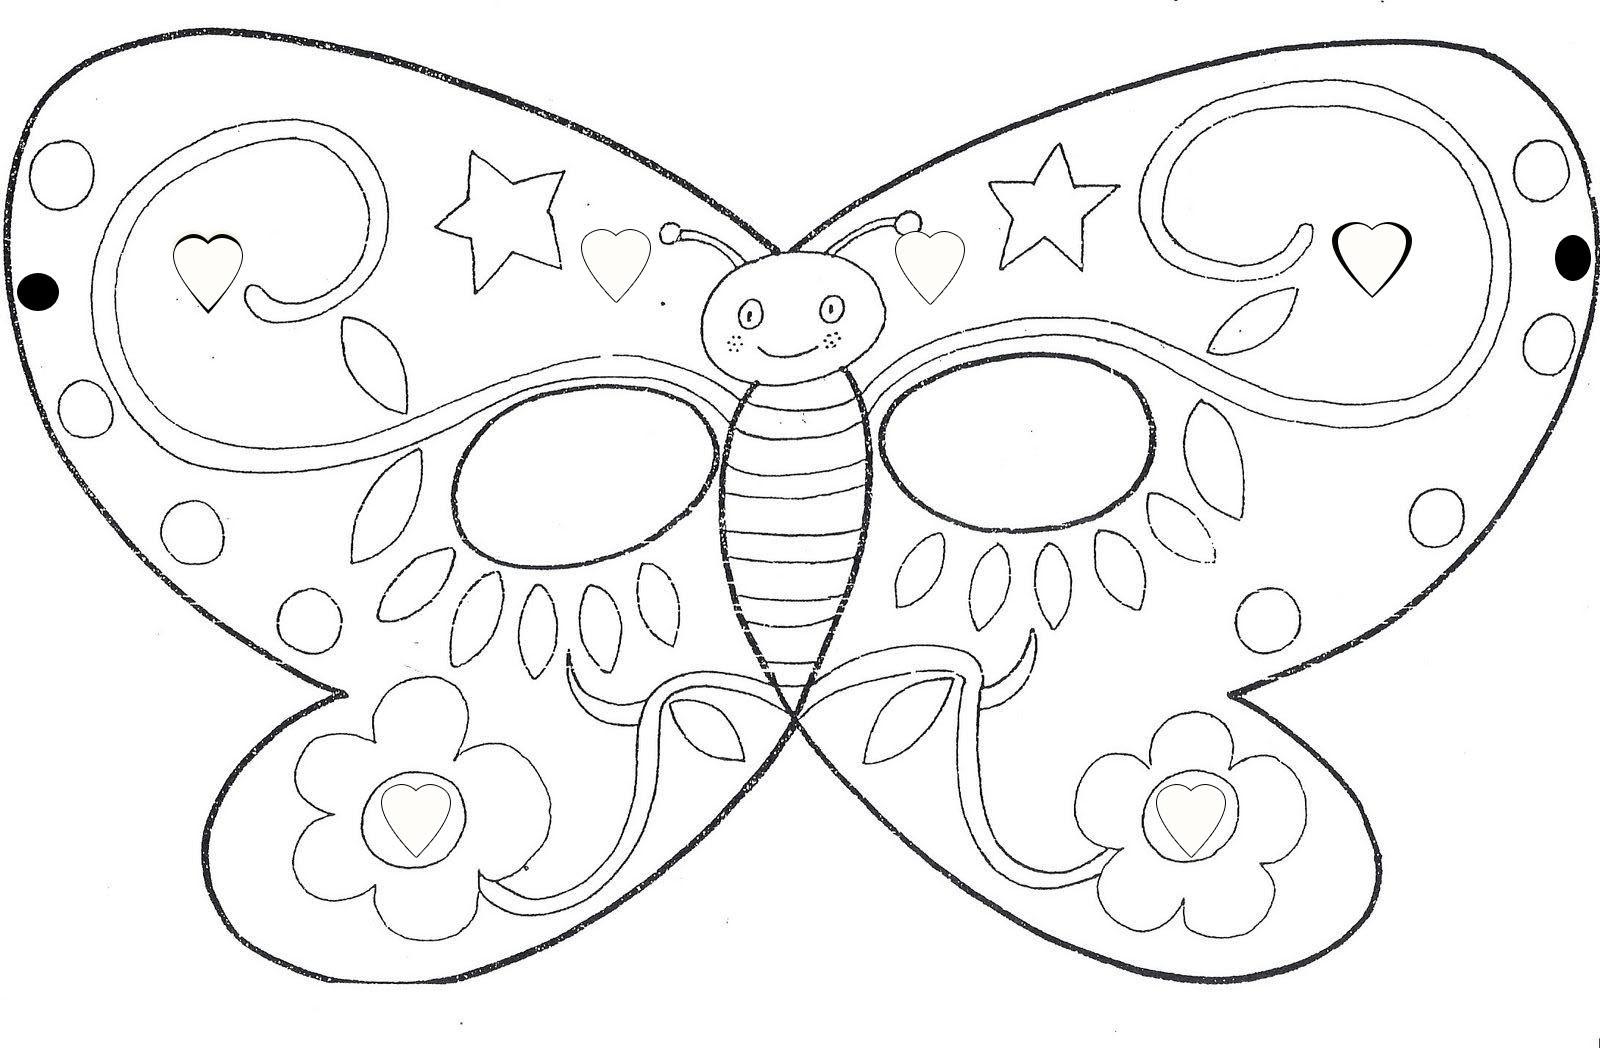 Kelebek Maskesi Sayfa 3 3 Arabulokucom